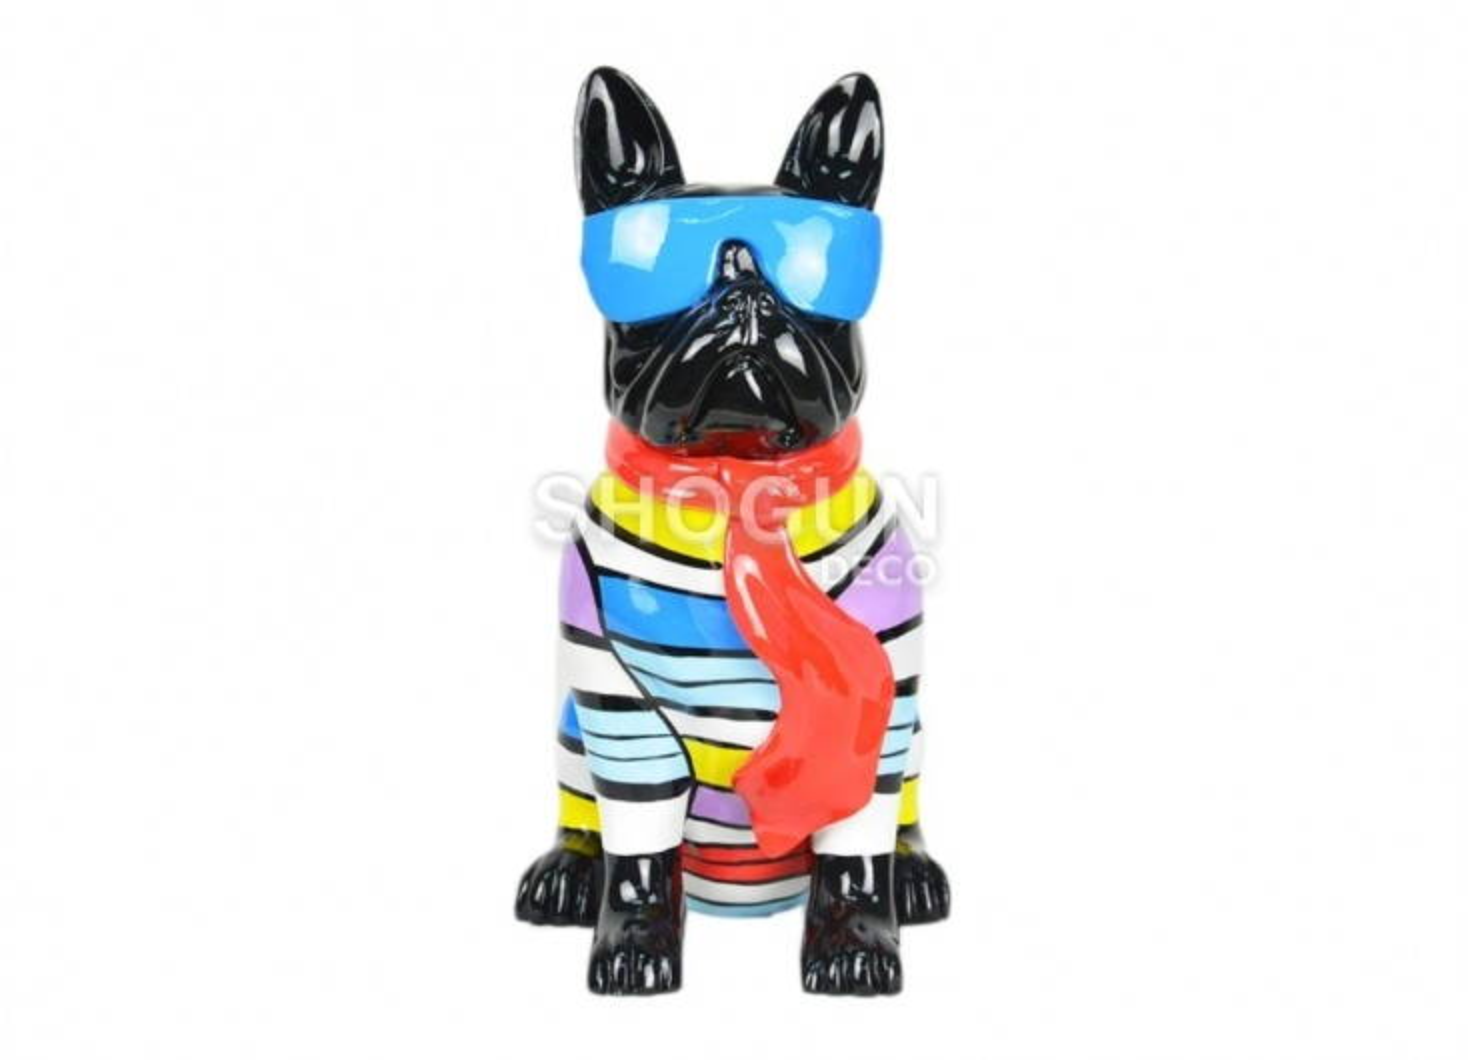 French bulldog statue